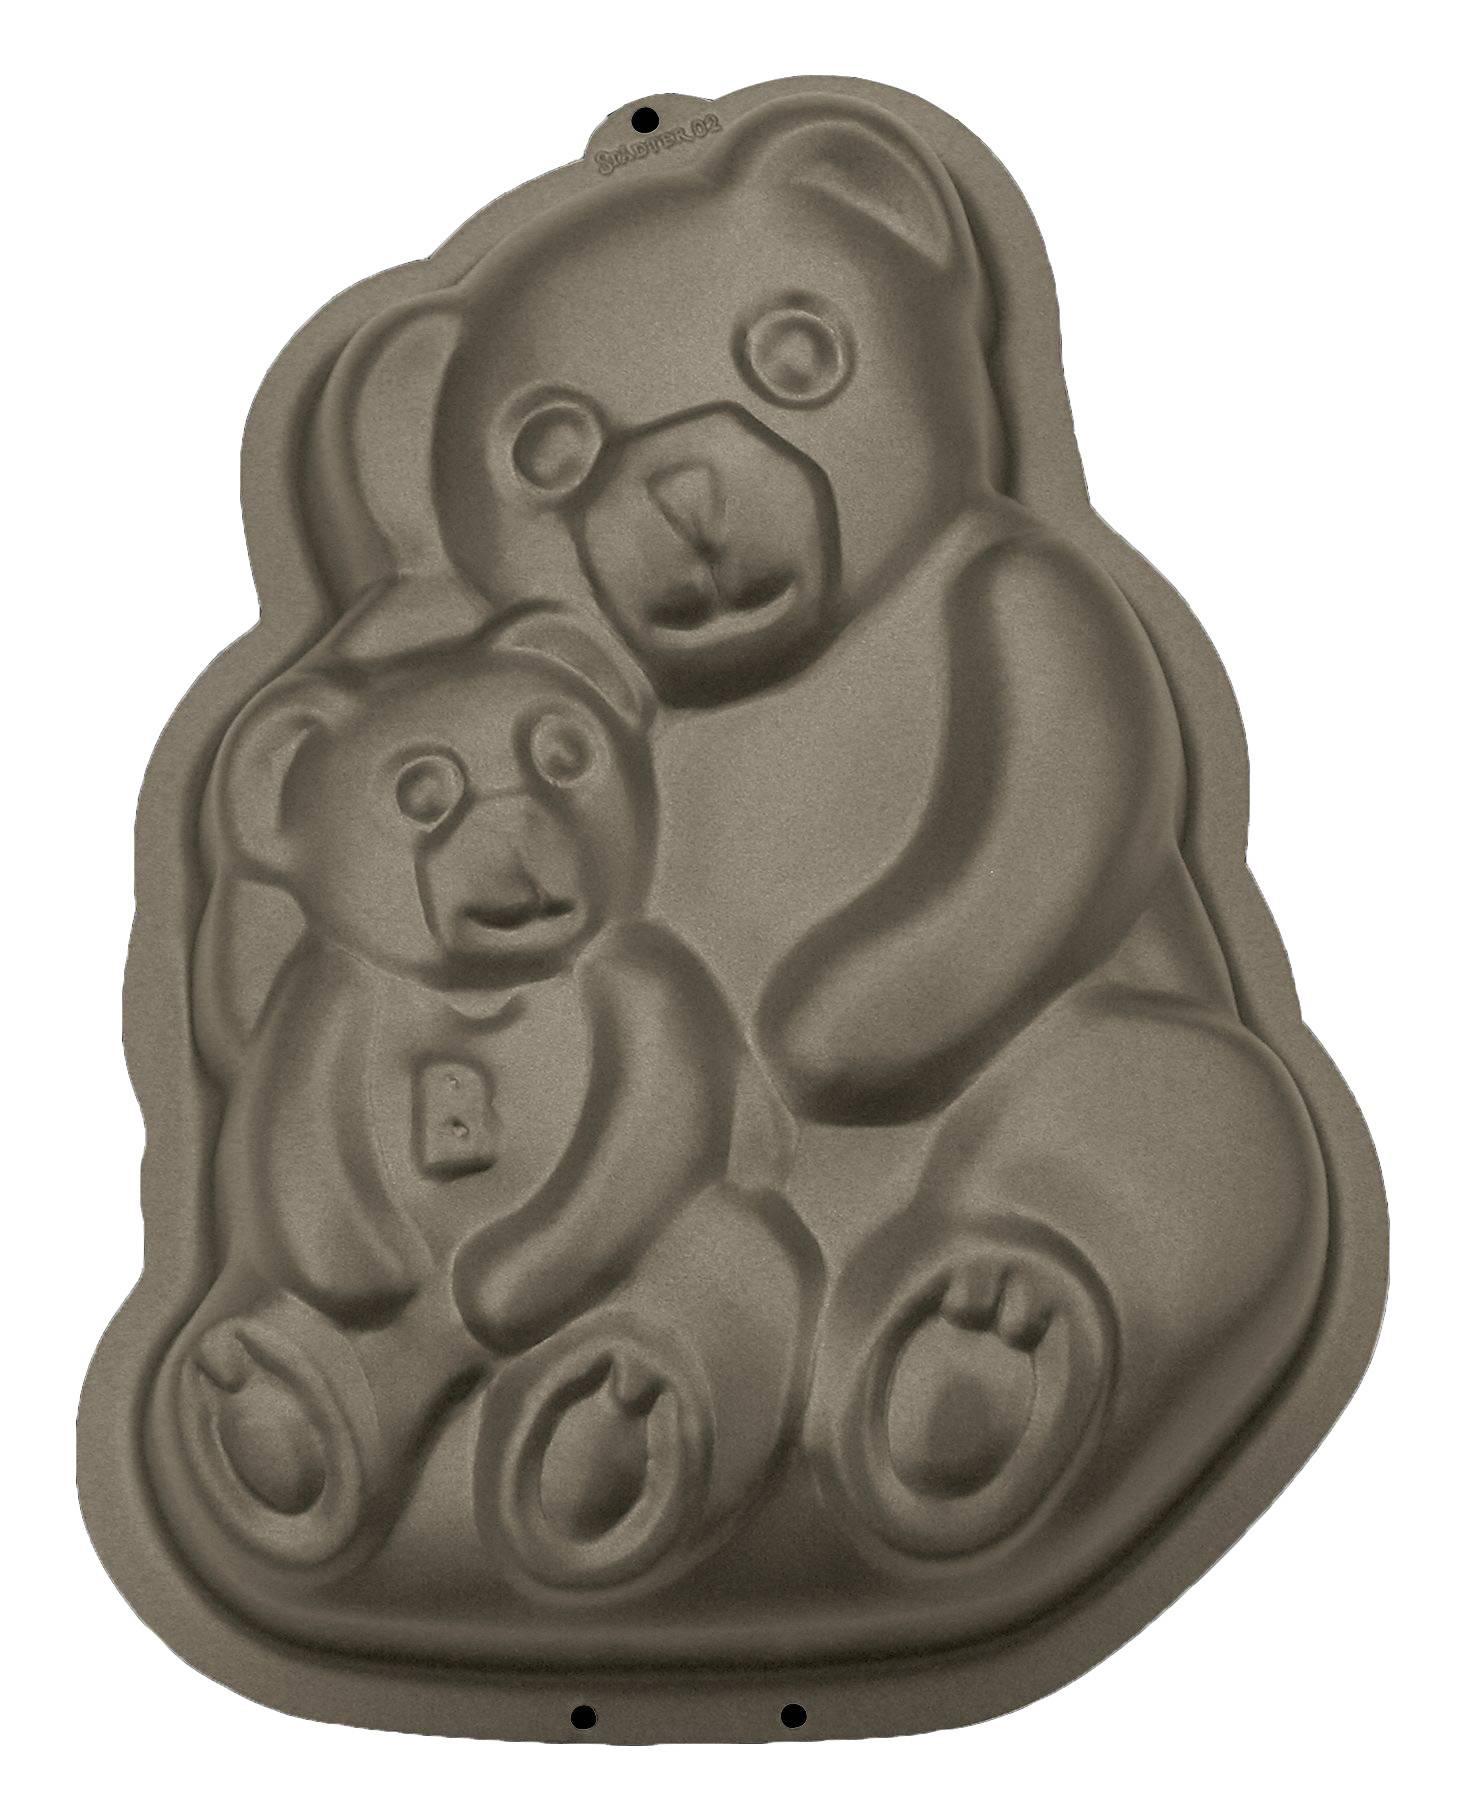 Formy na pečení - Medvídci 2 ks - Stadter